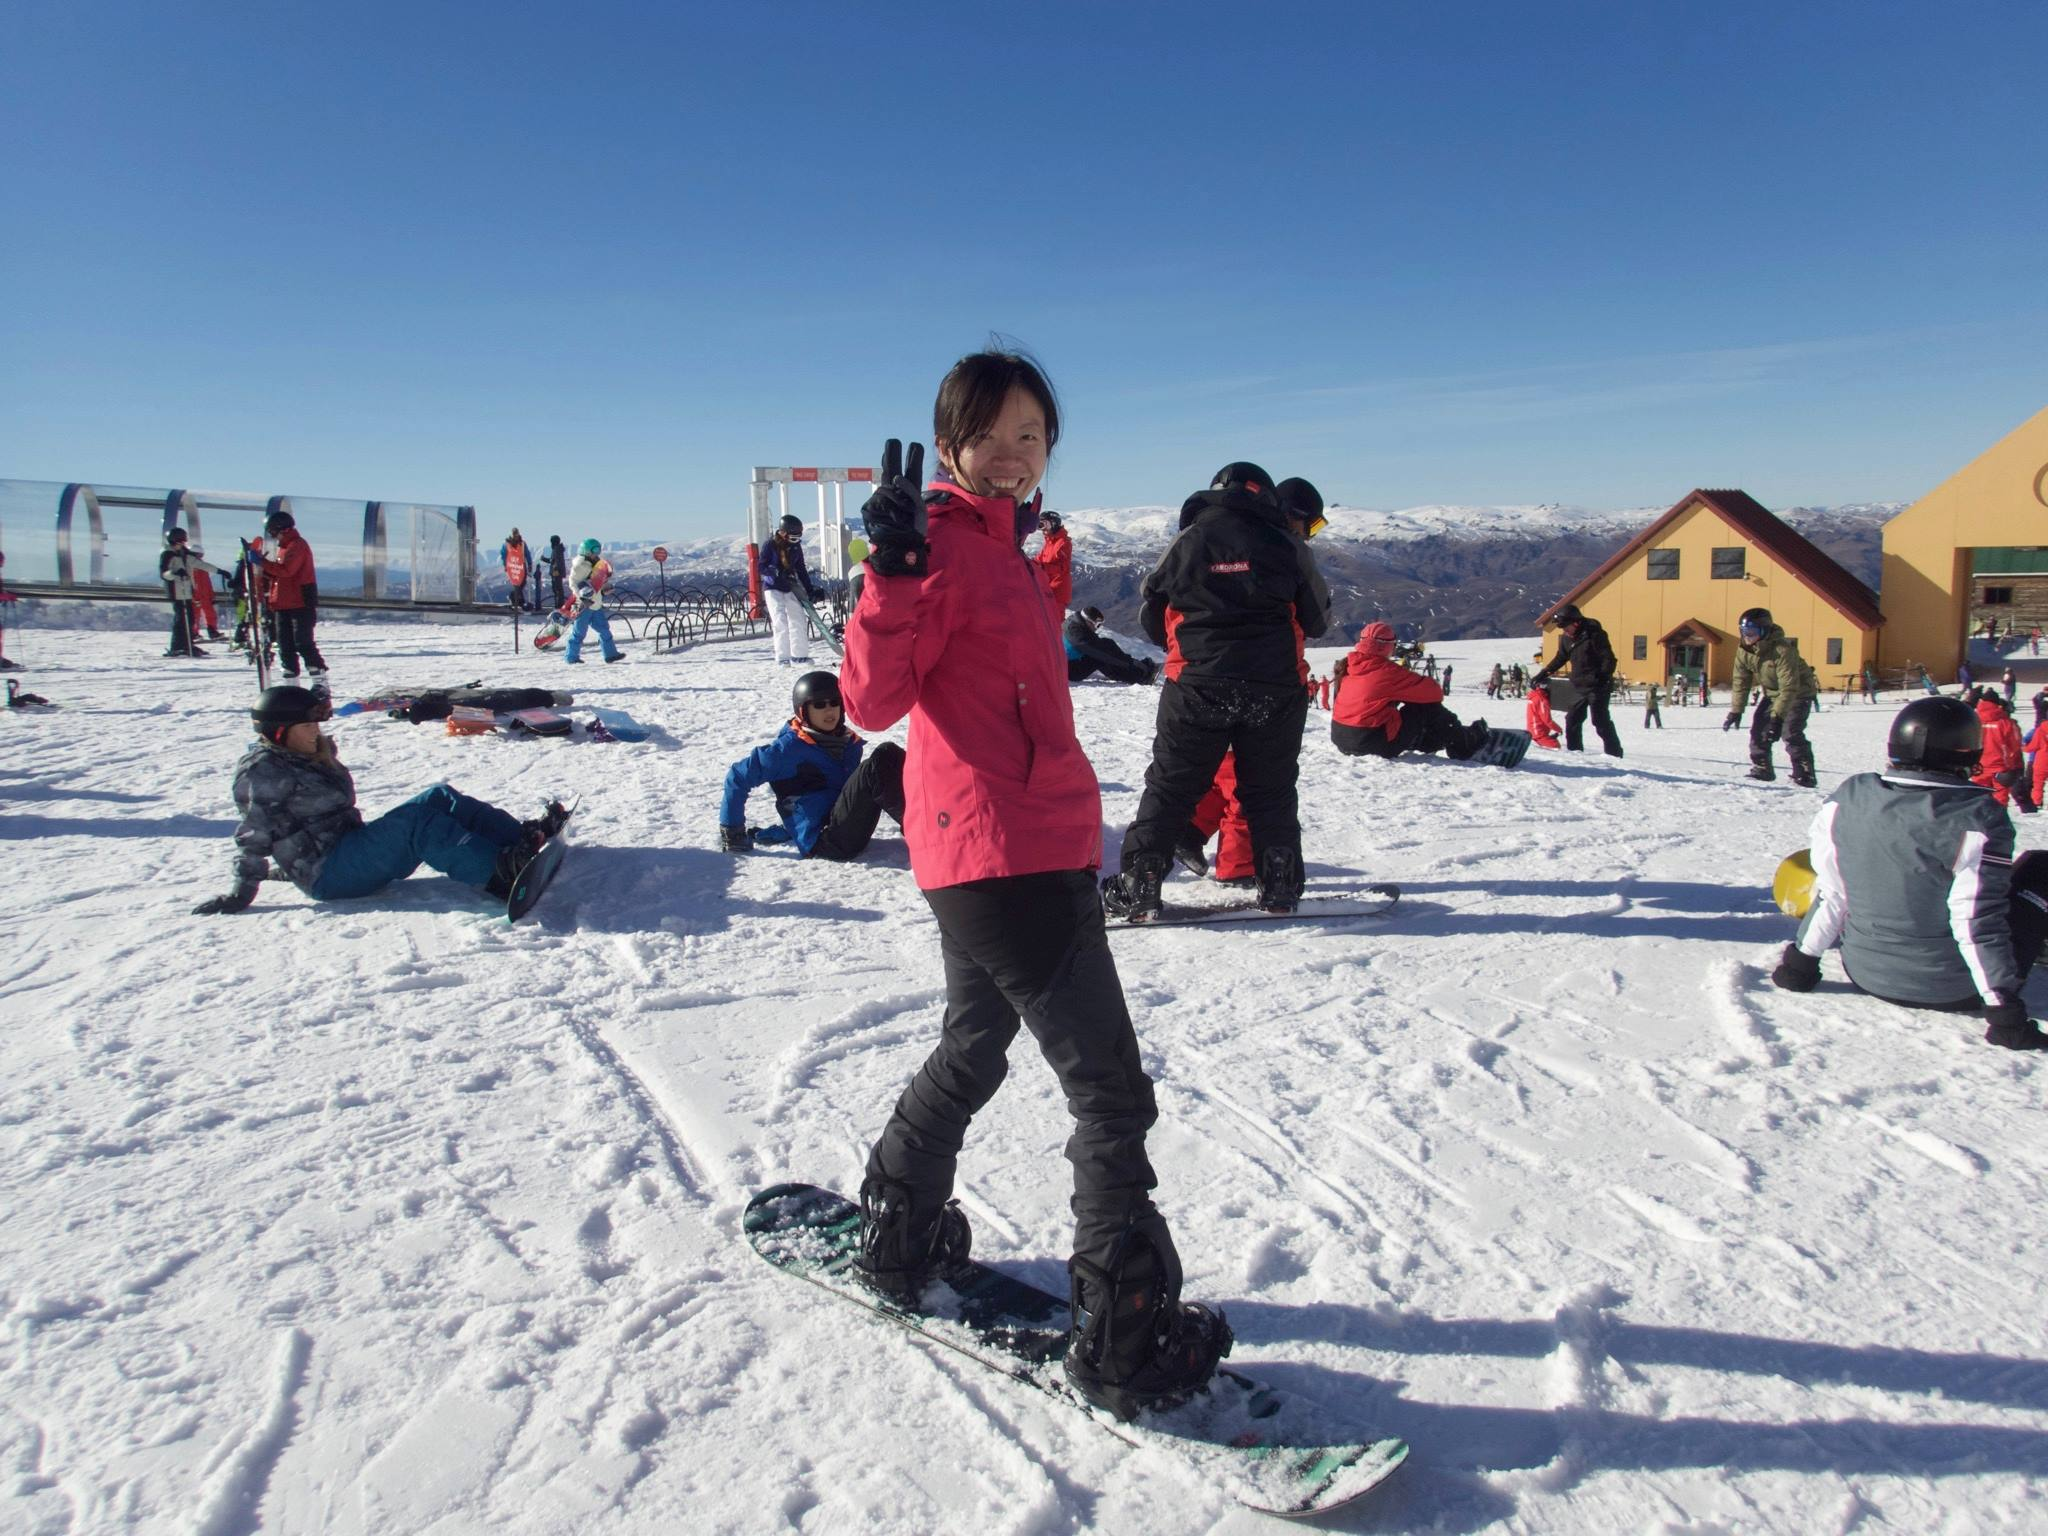 Panny snowboarding